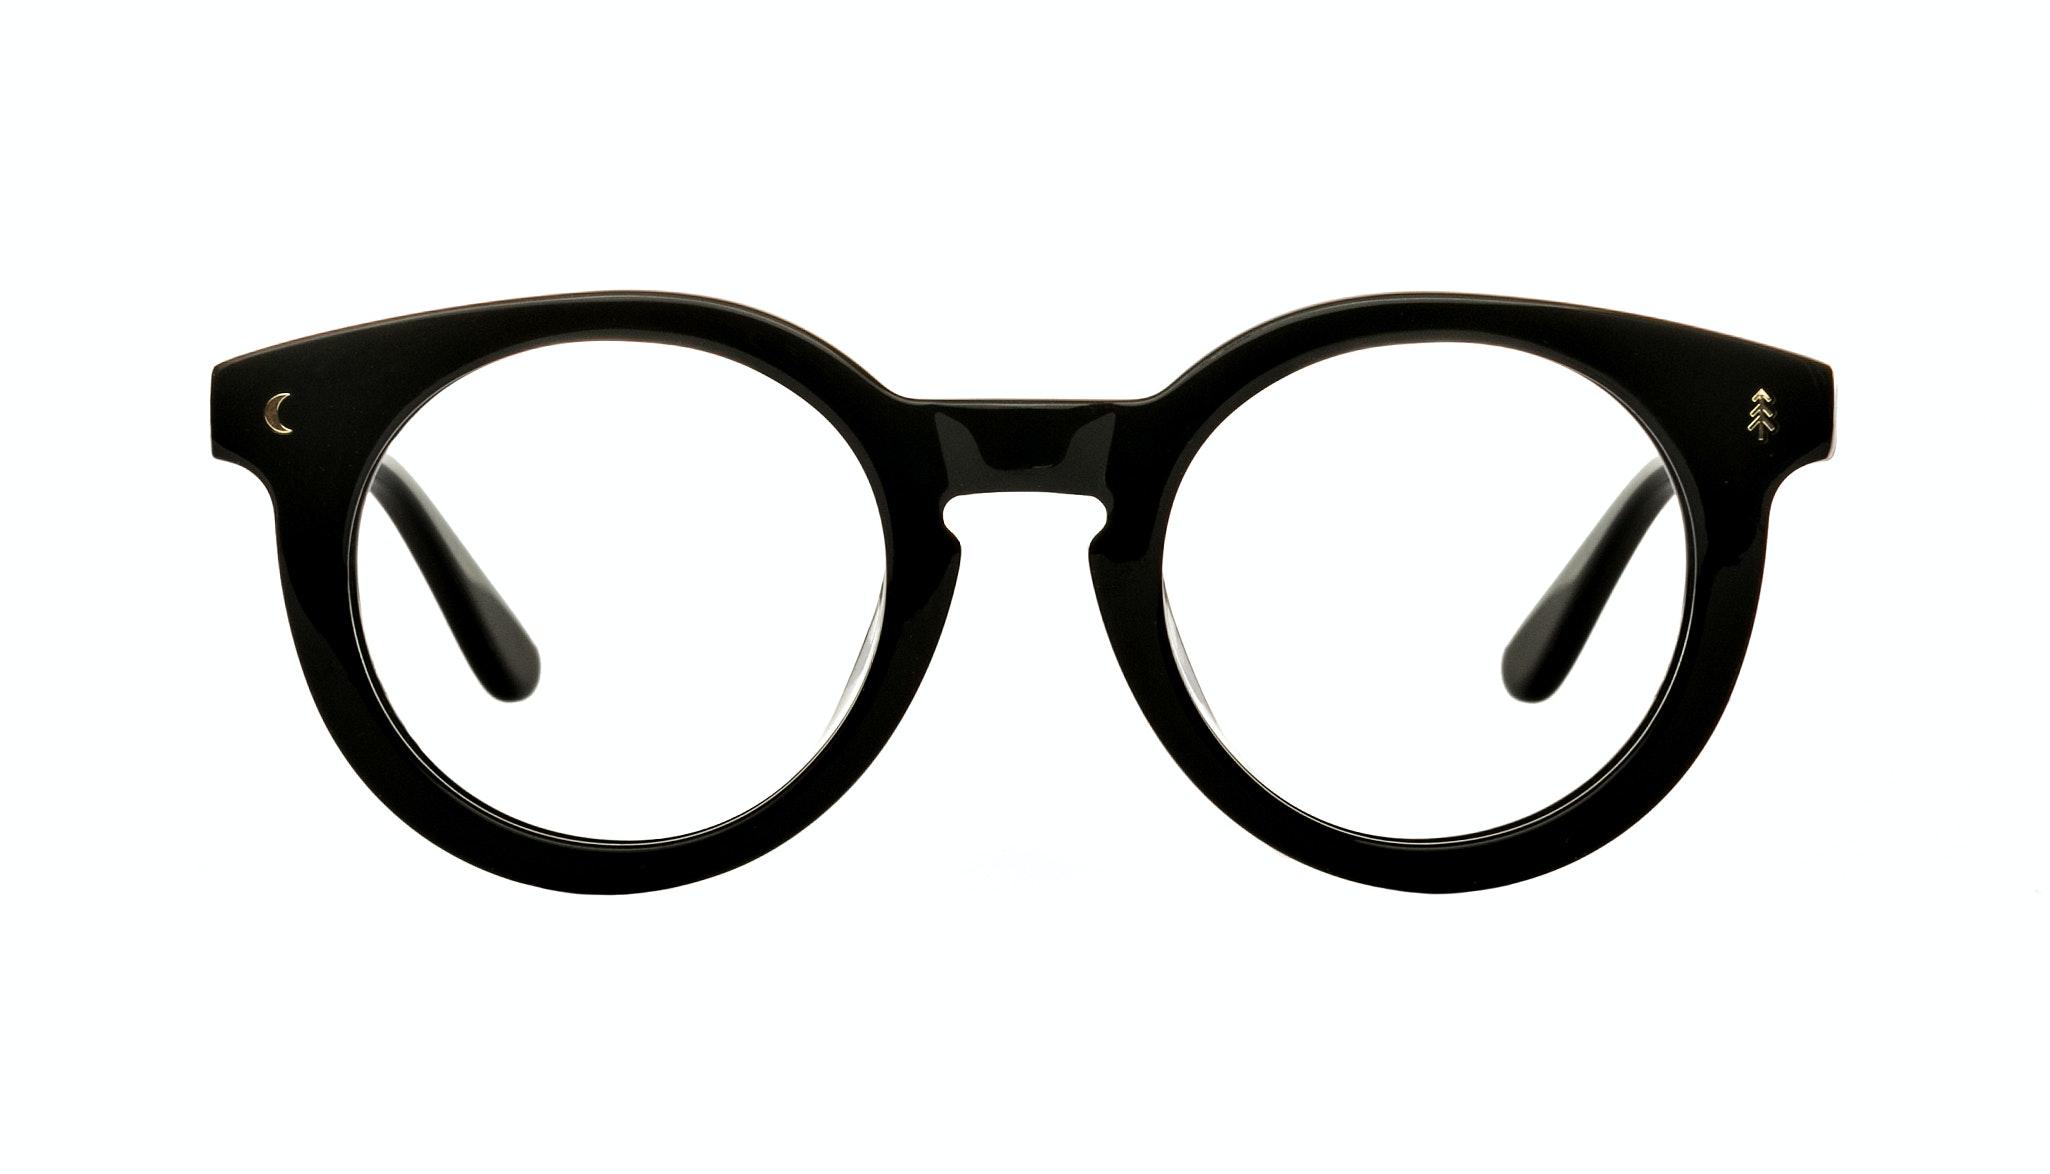 Affordable Fashion Glasses Round Eyeglasses Women Trailblazer Eclipse Black Front